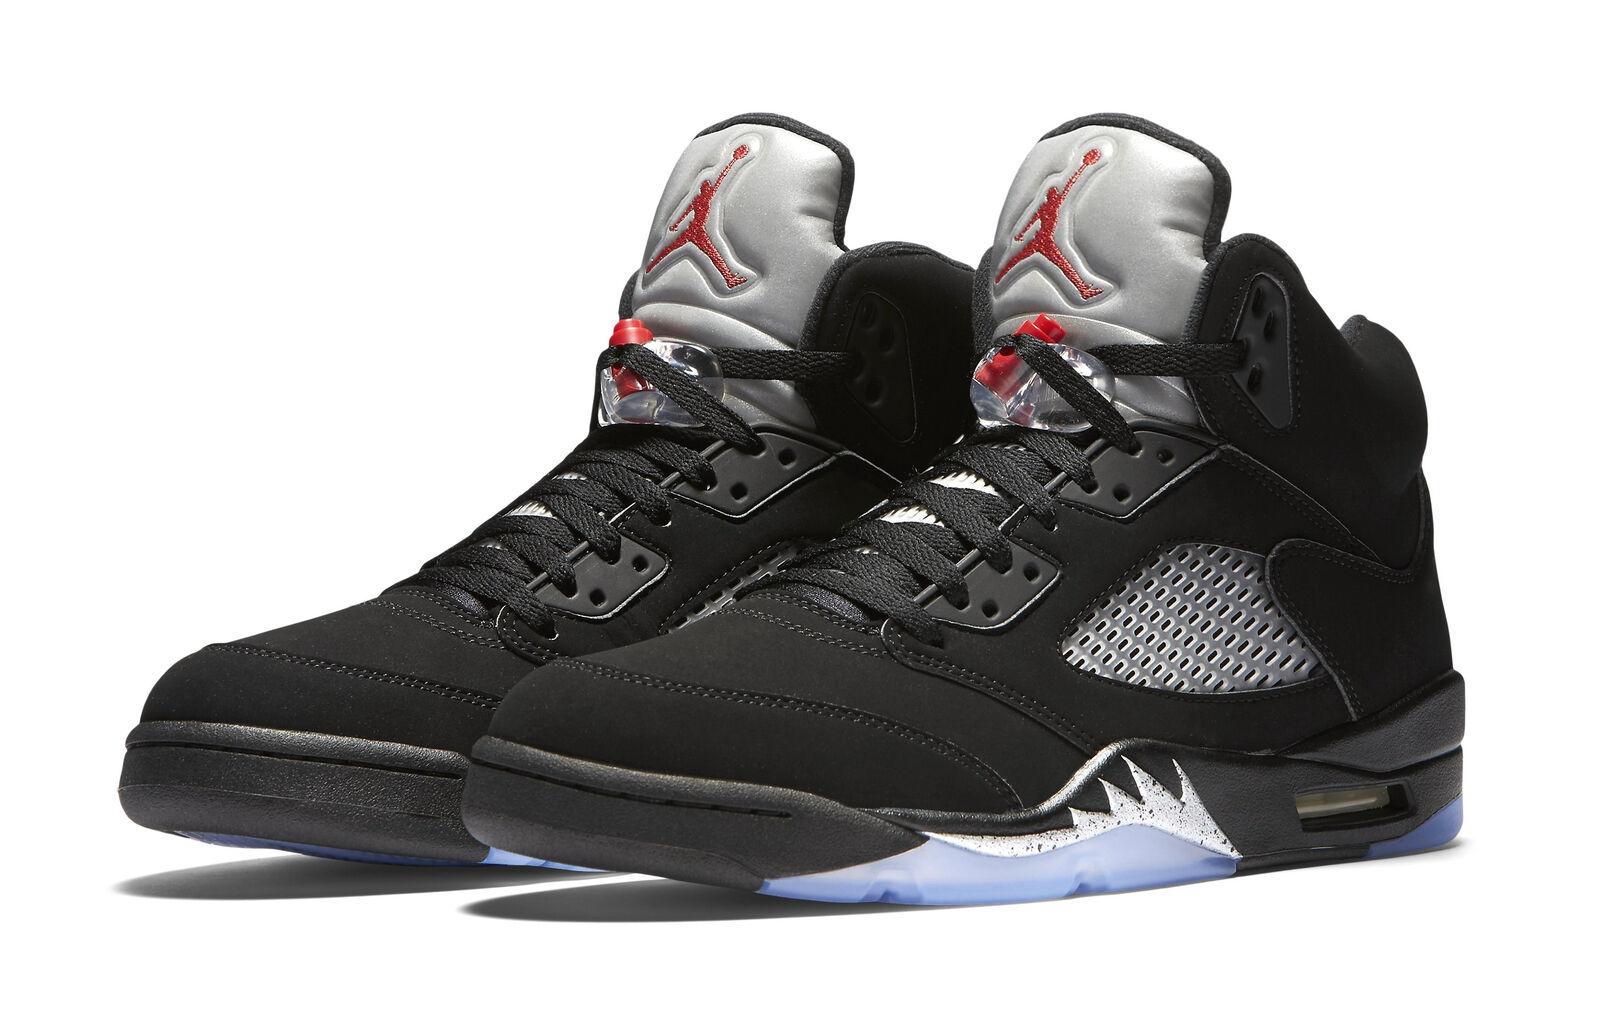 8f2a3910ed8e5a Nike Air Jordan Retro V Men s Shoes